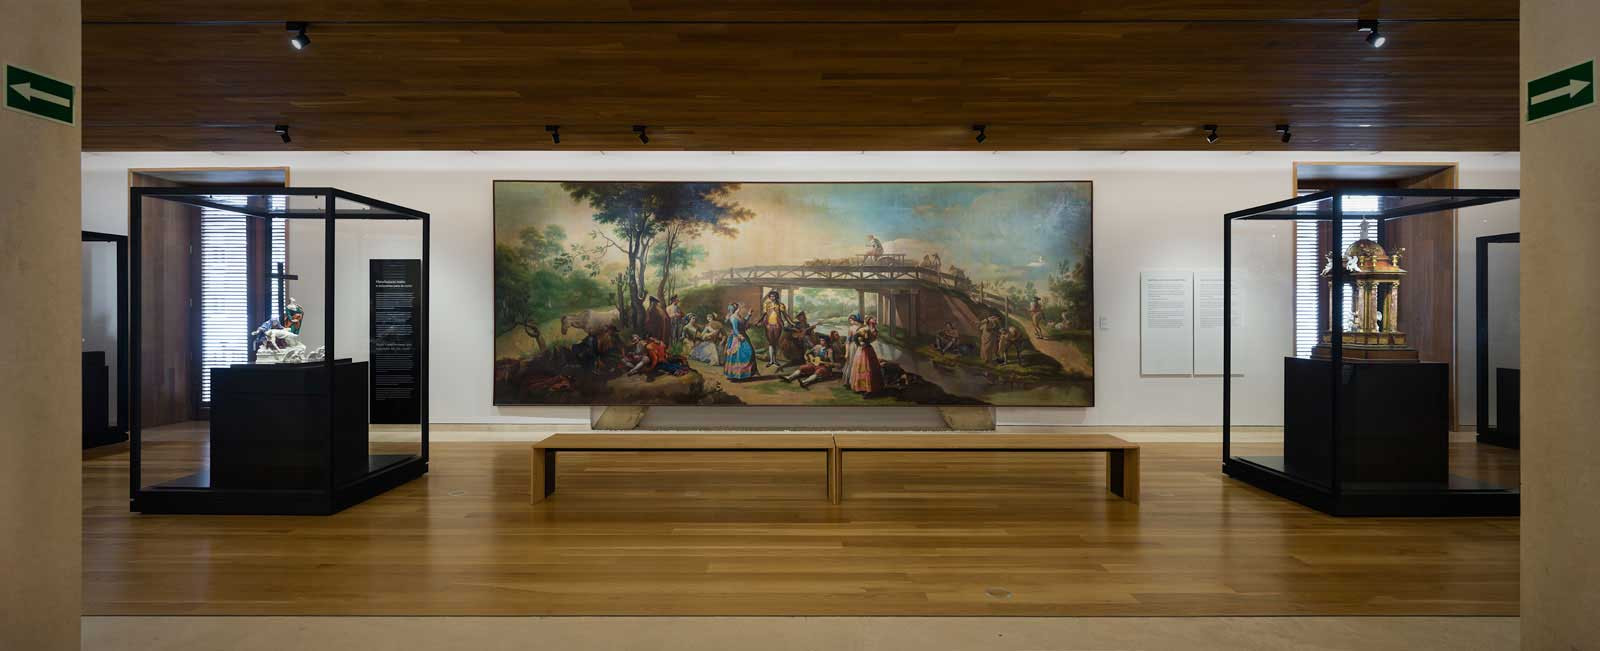 Museo+de+Historia+de+Madrid+·+Ypuntoendi